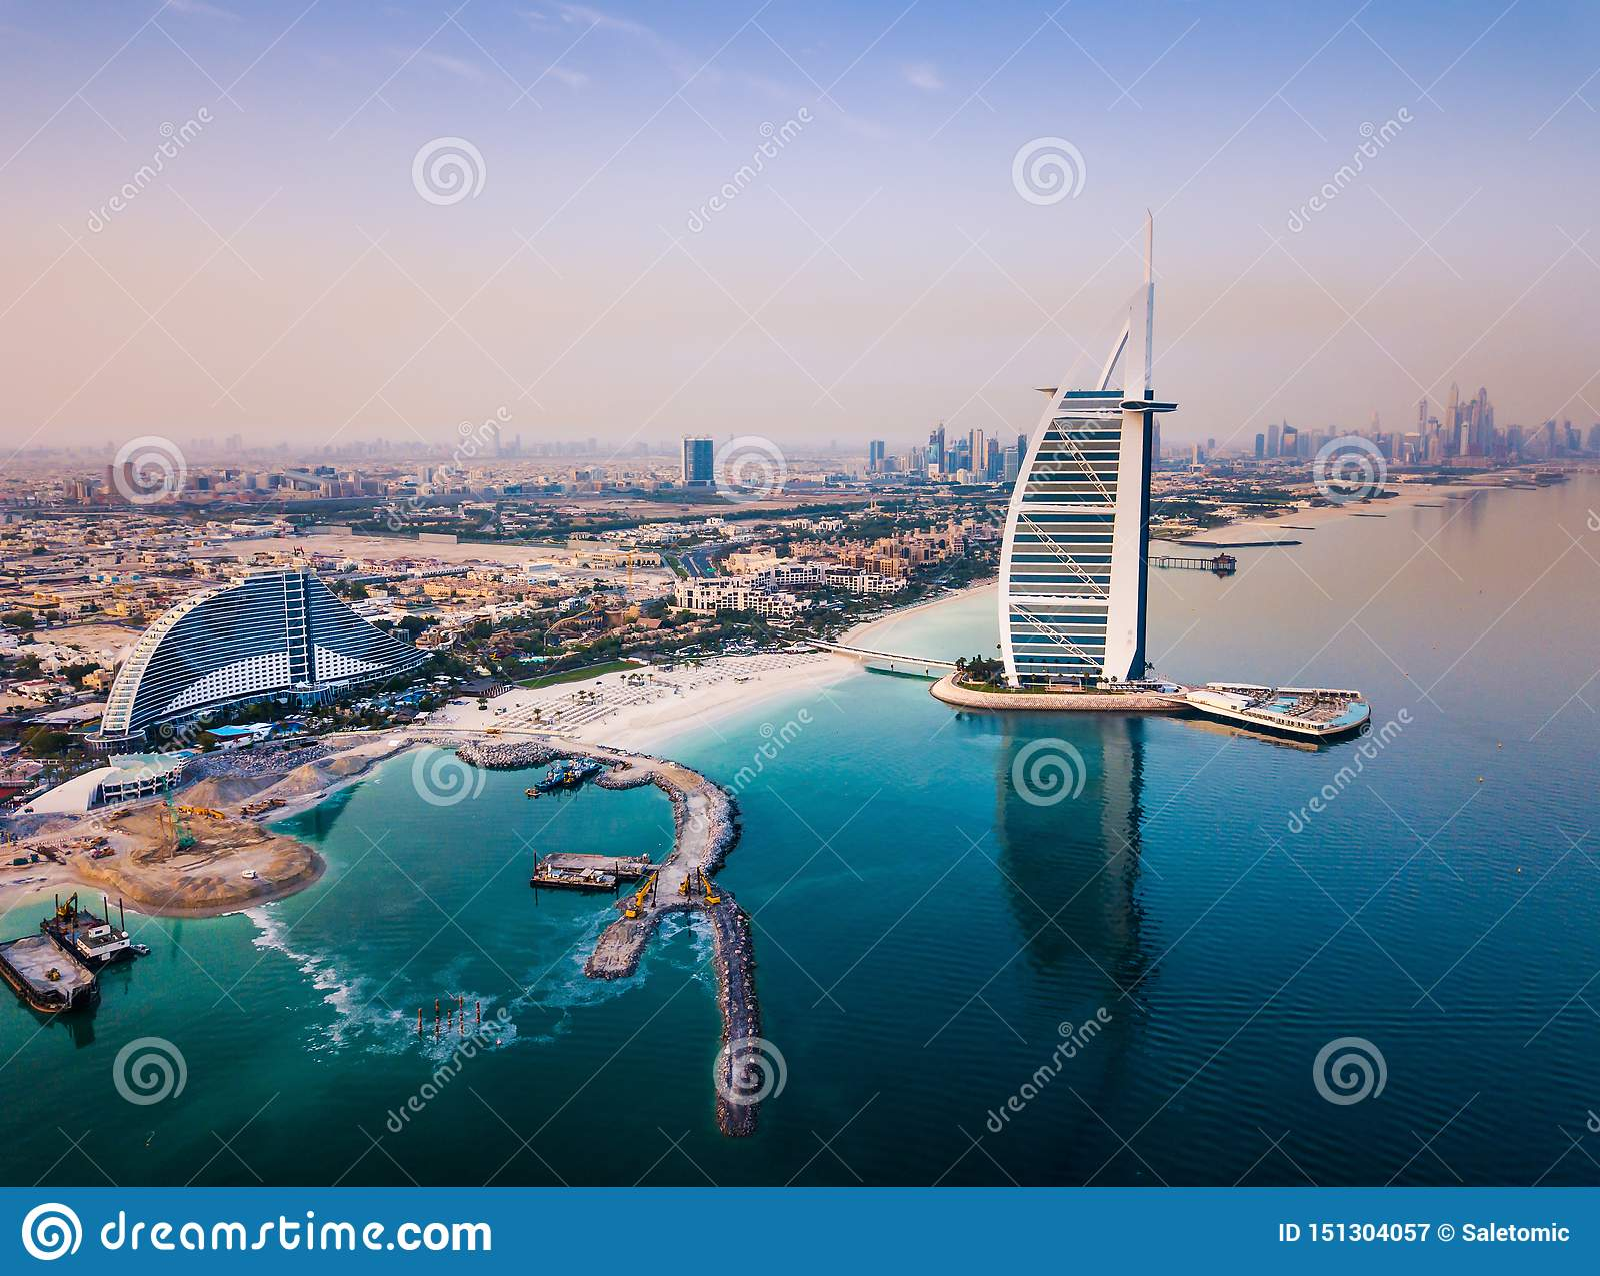 Burj Al Arab luxury hotel and Dubai marina skyline in the background